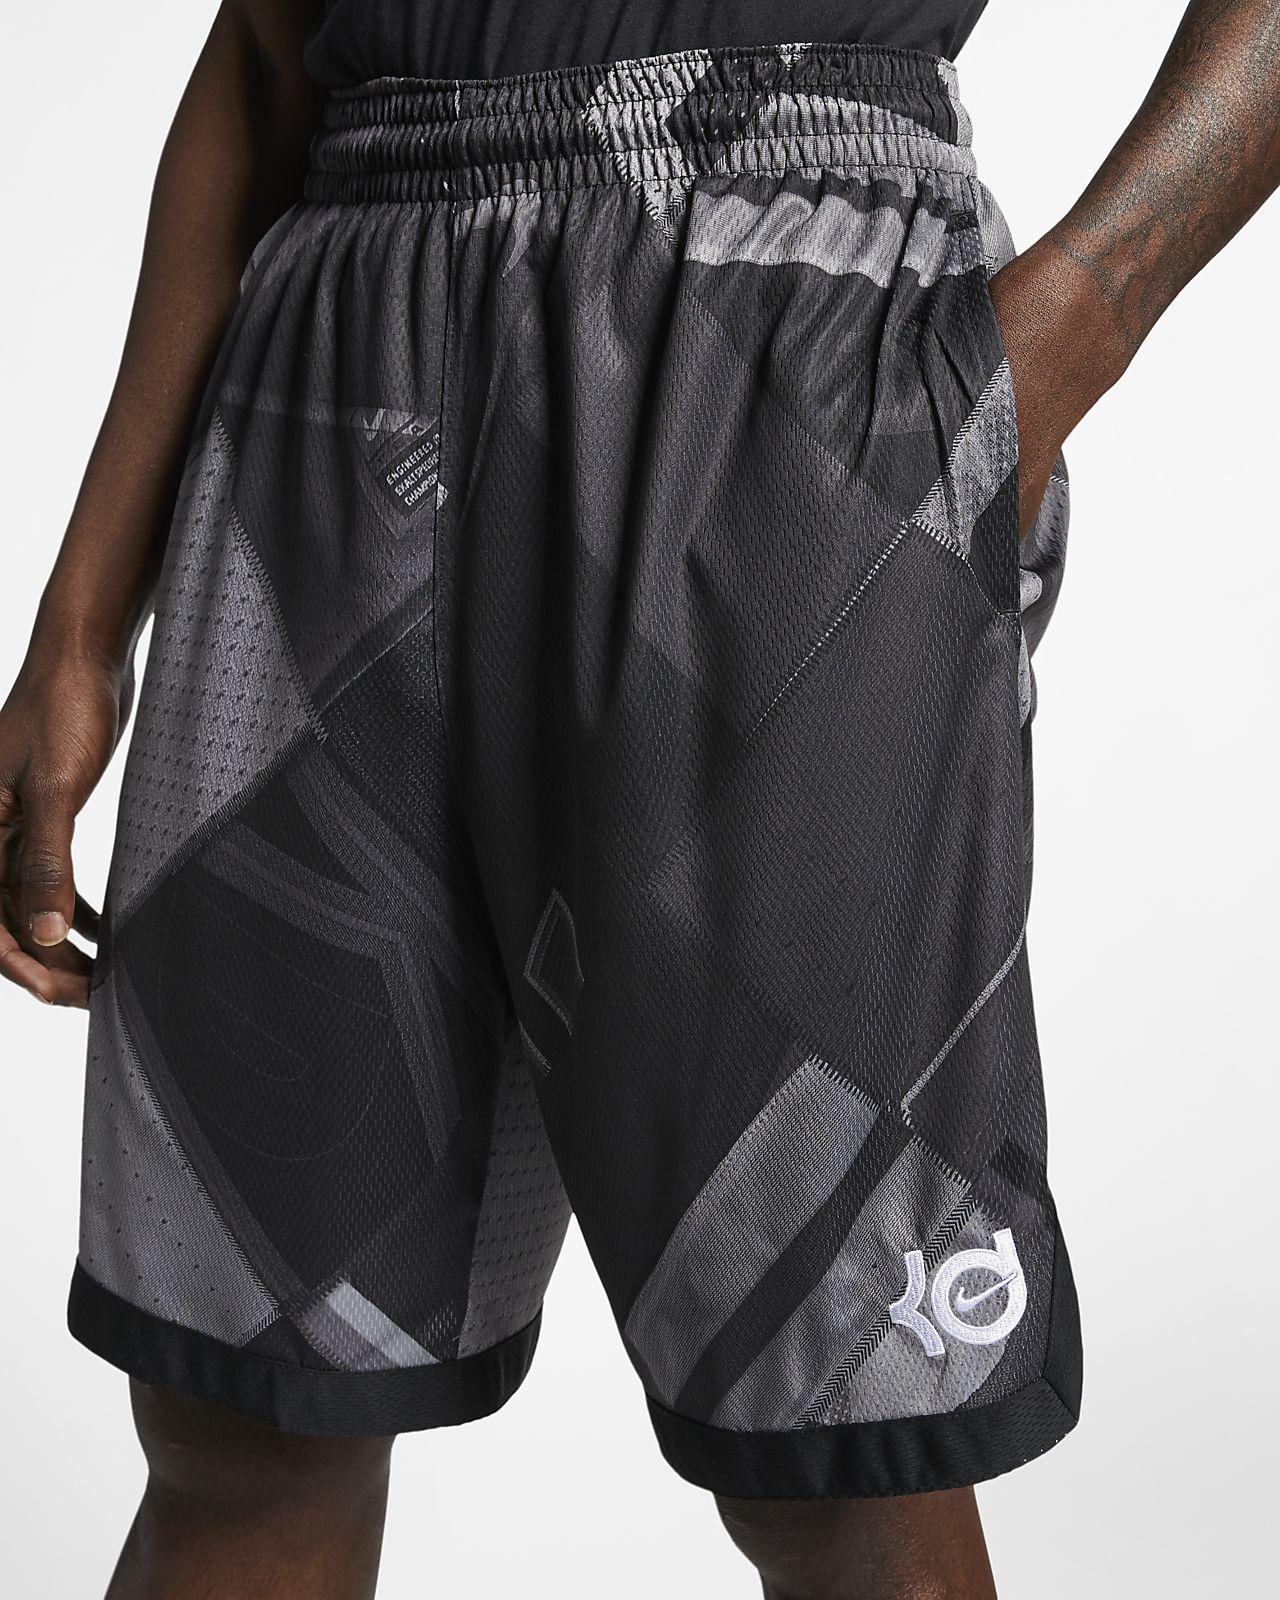 00069a3c0d5 Low Resolution KD Men's Basketball Shorts KD Men's Basketball Shorts